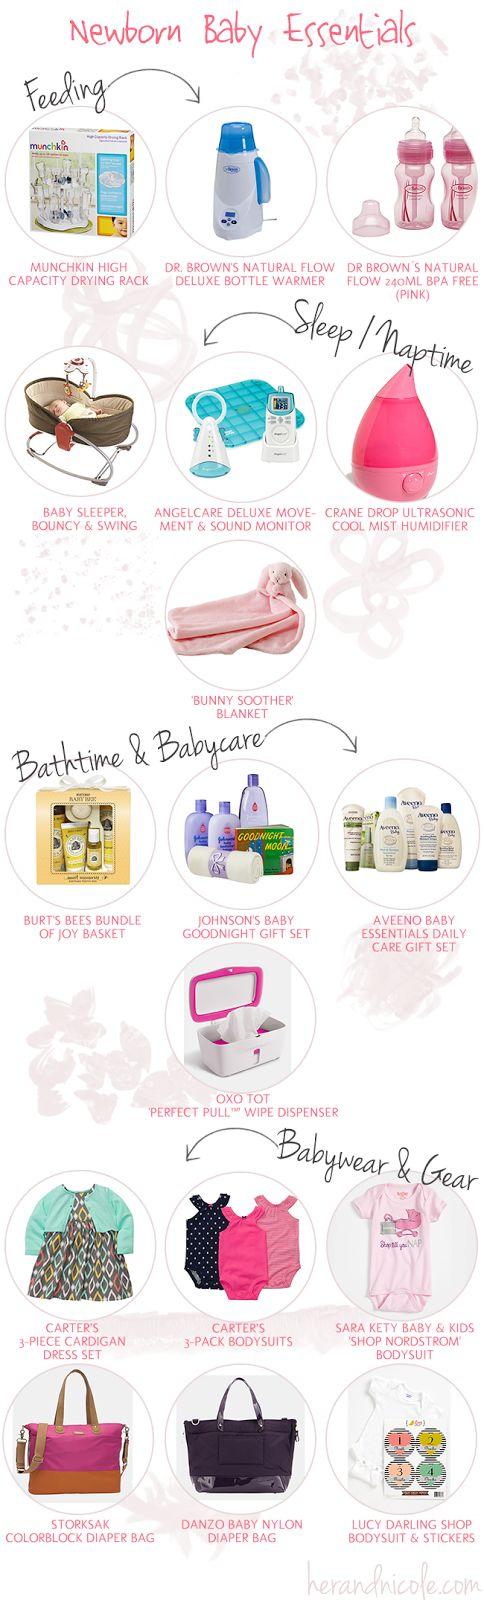 necessities for a newborn